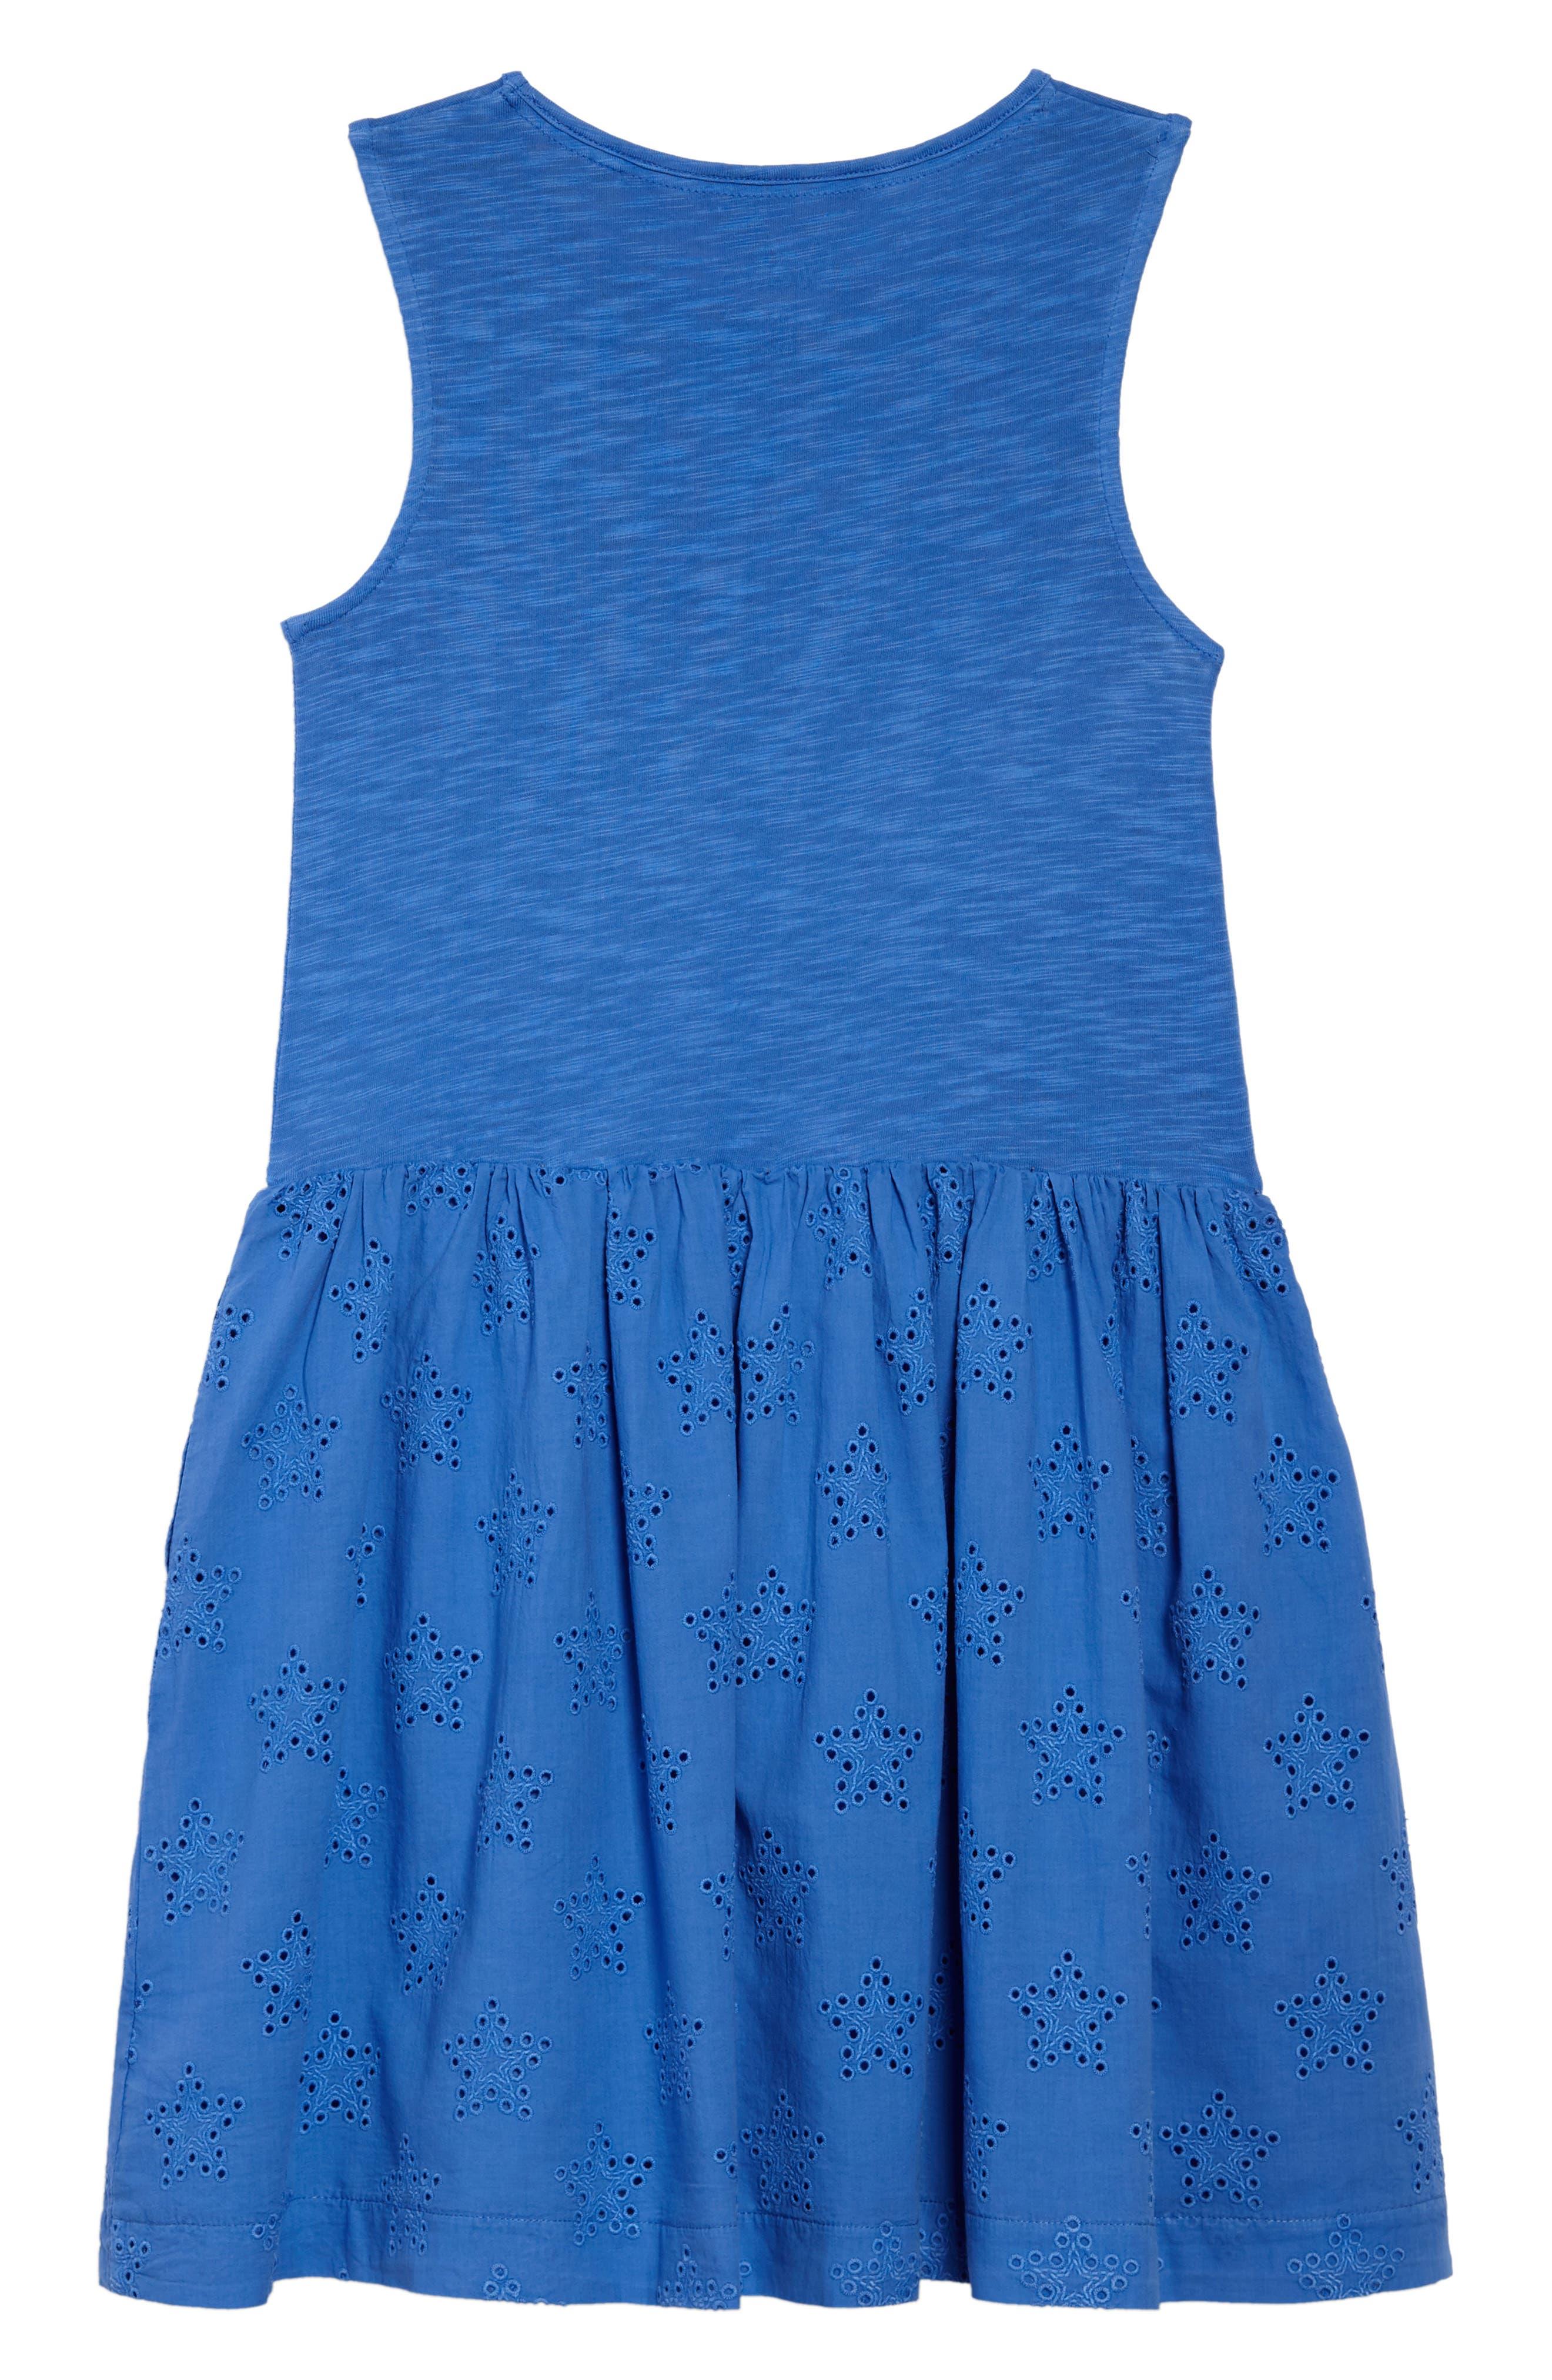 MINI BODEN,                             Eyelet Dress,                             Alternate thumbnail 2, color,                             424